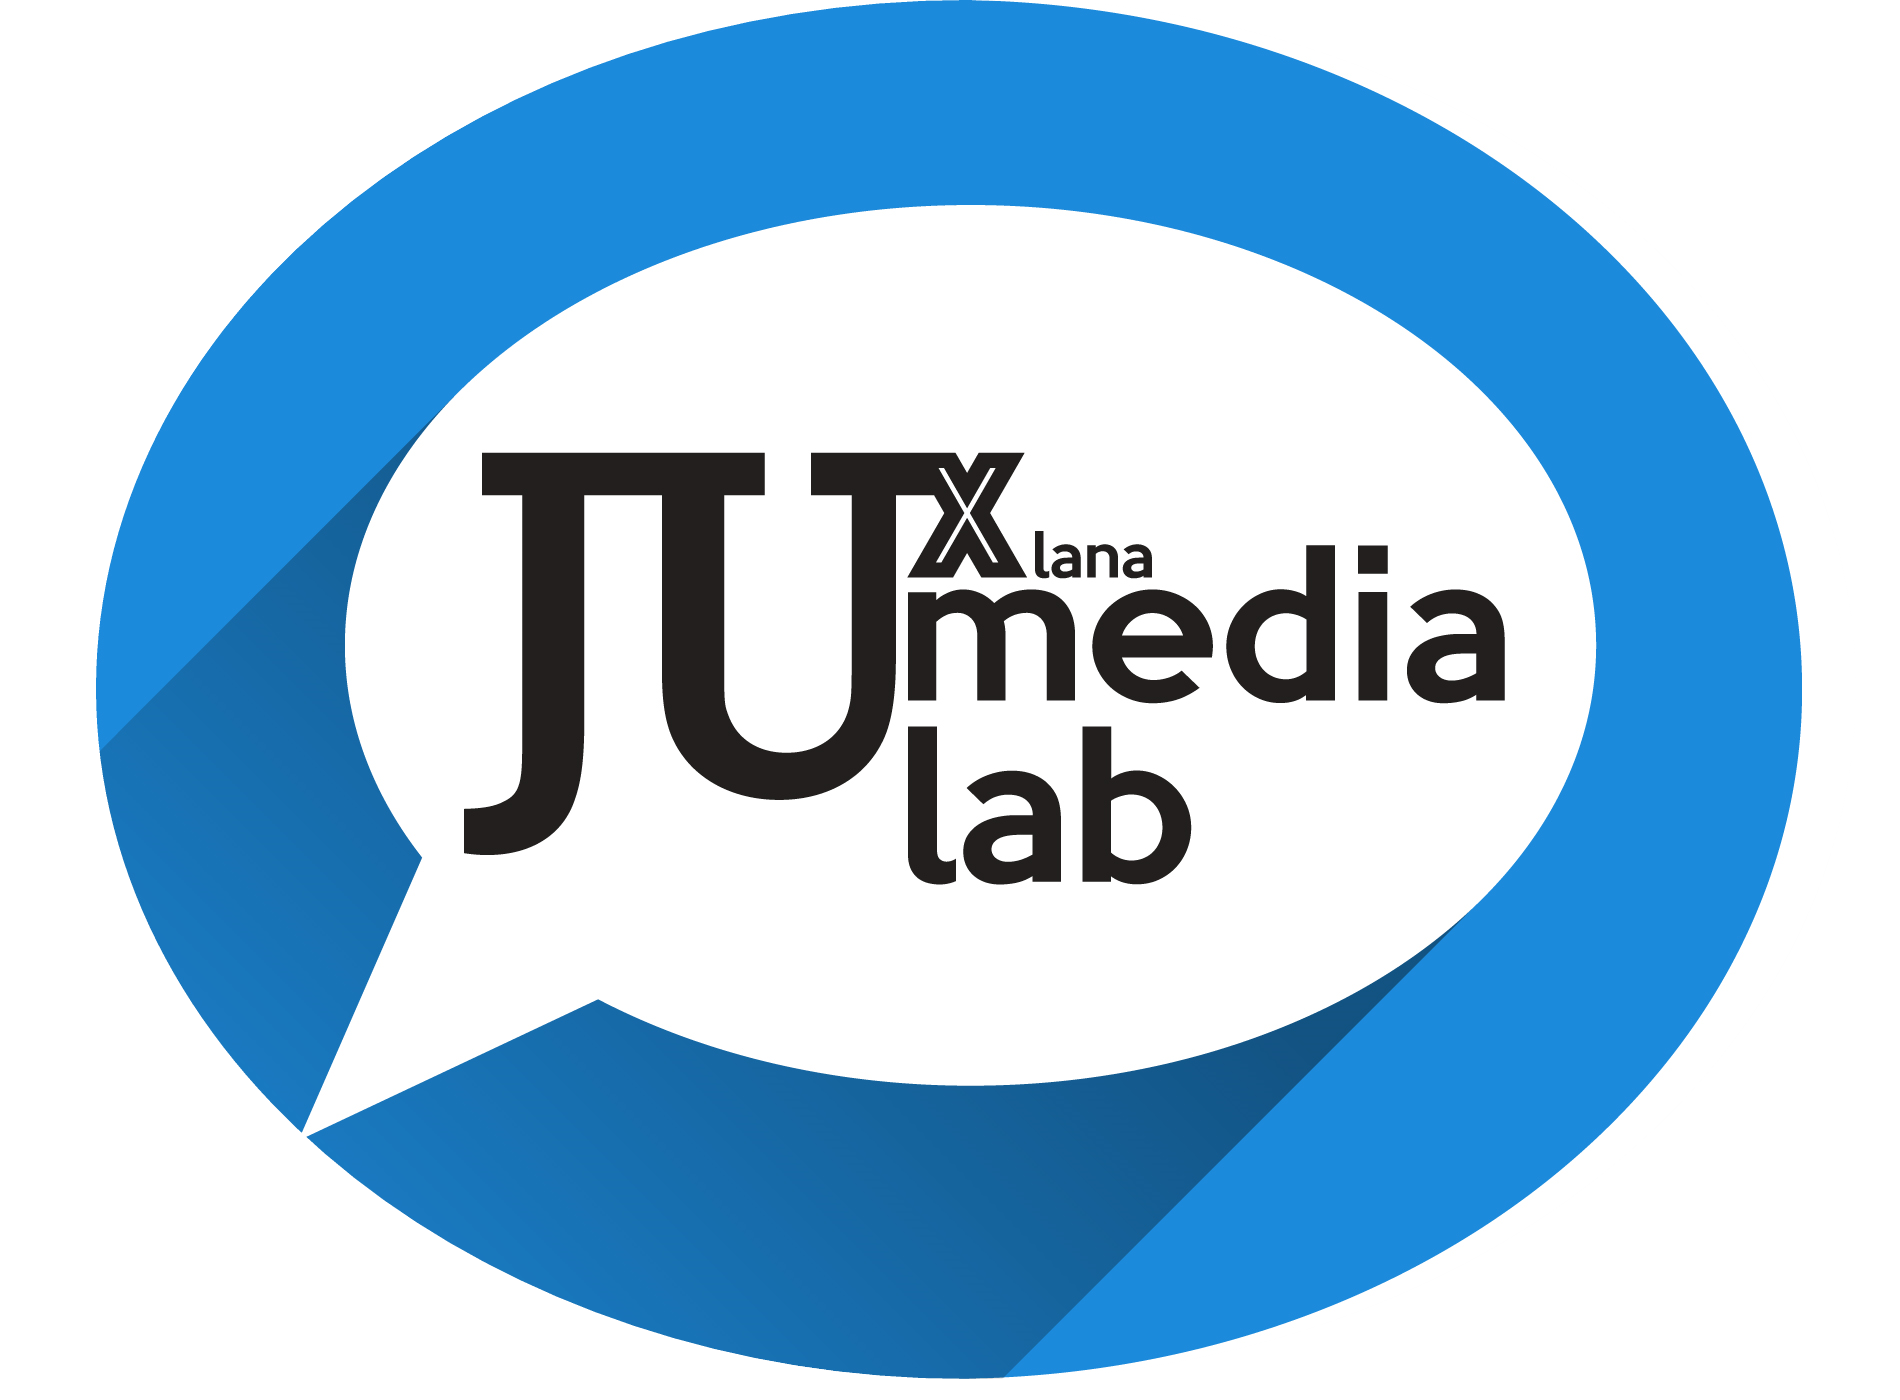 Jugendzentrum Jux Lana - MediaLab